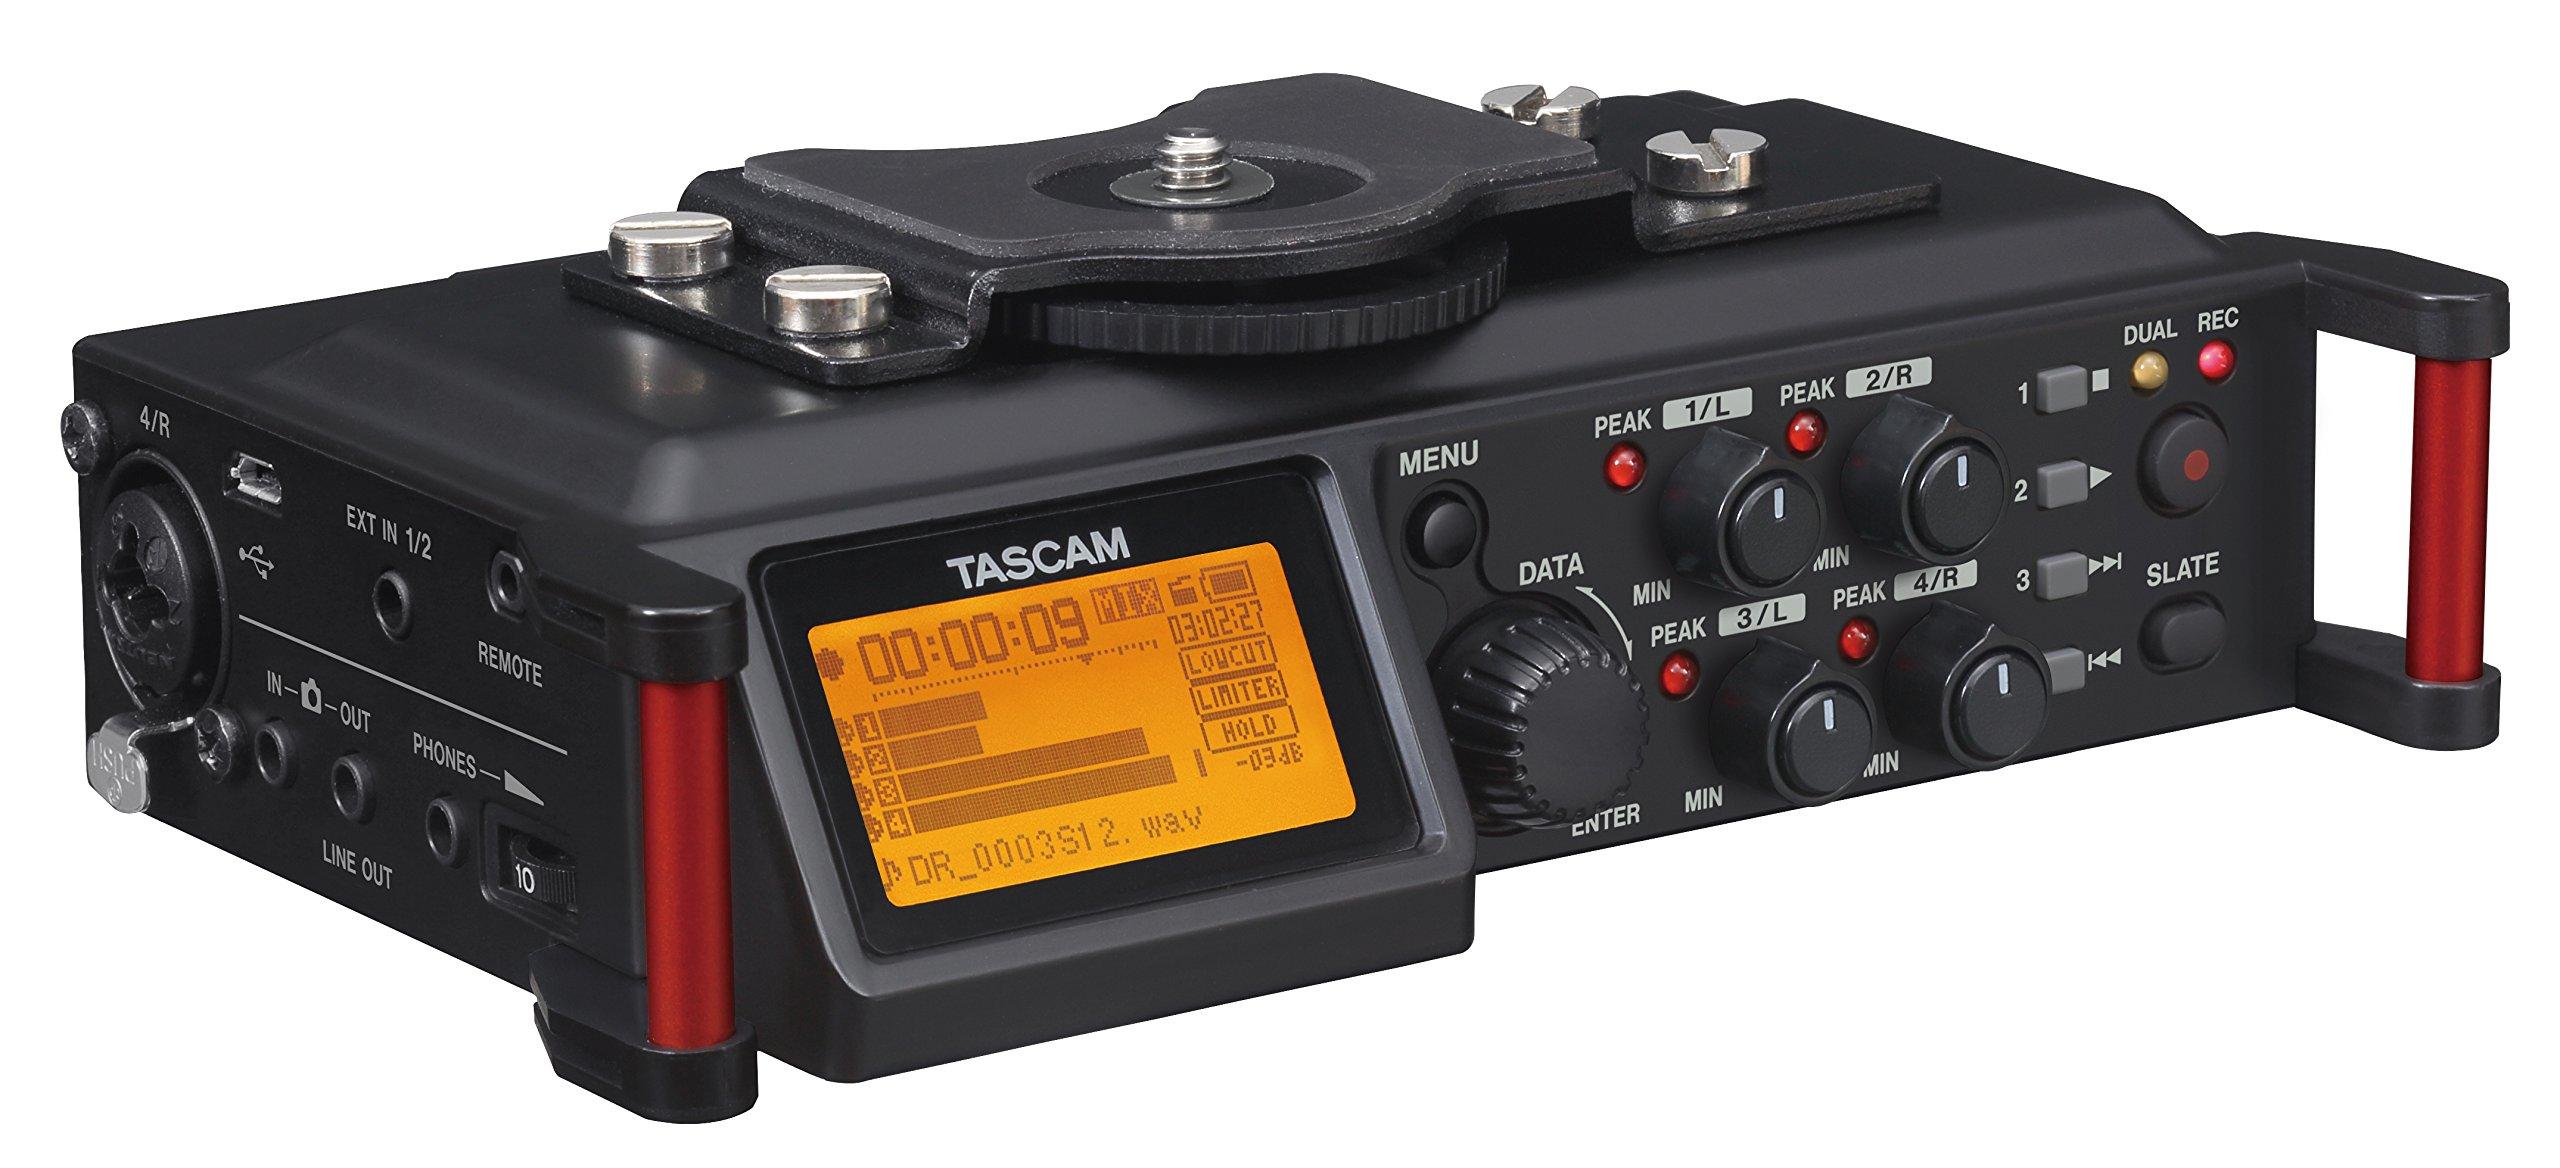 Tascam DR-70D 4-Channel Portable Recorder